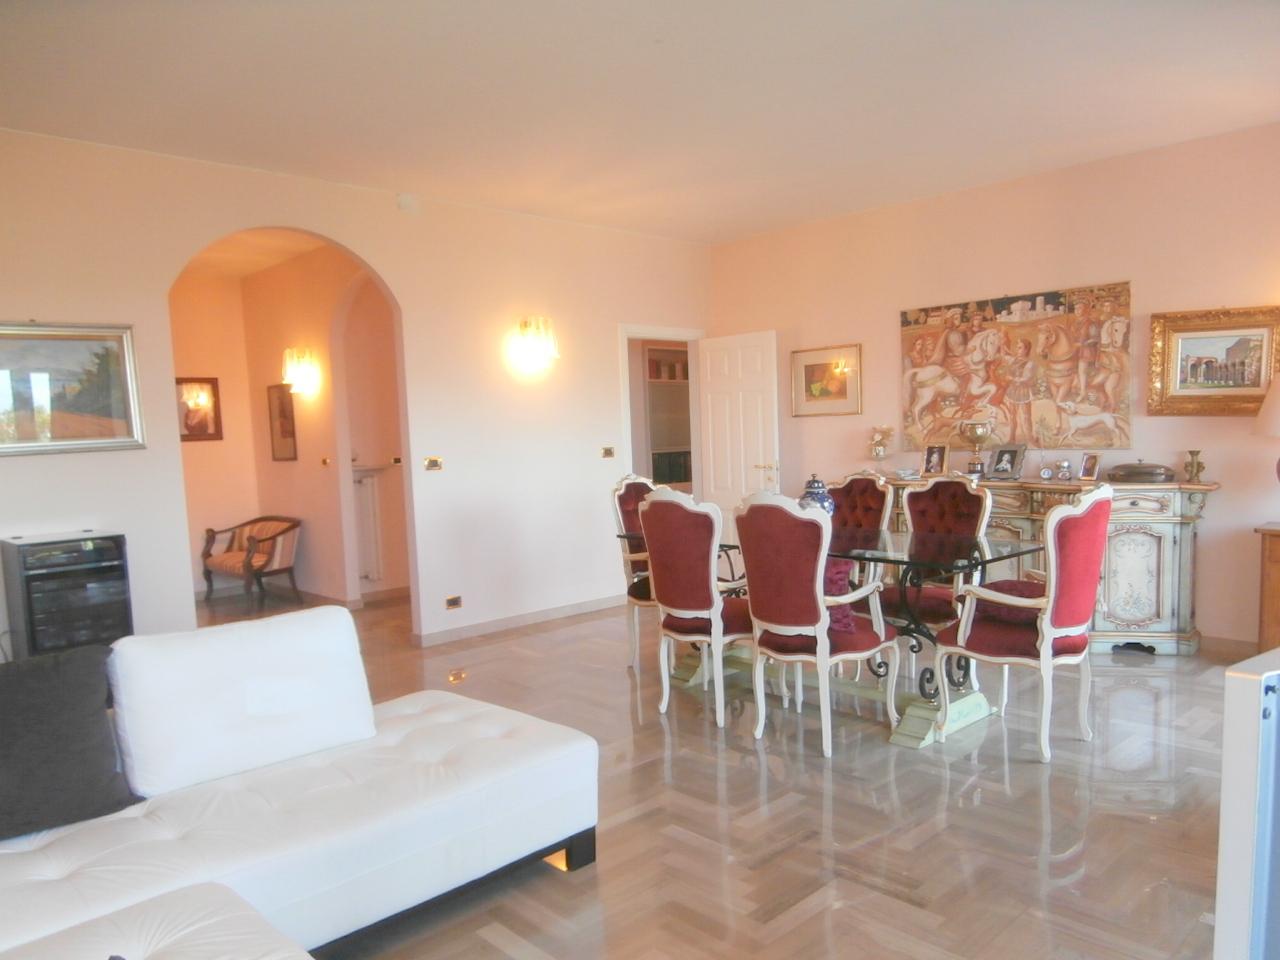 Appartamento, centro storico, Vendita - Ferrara